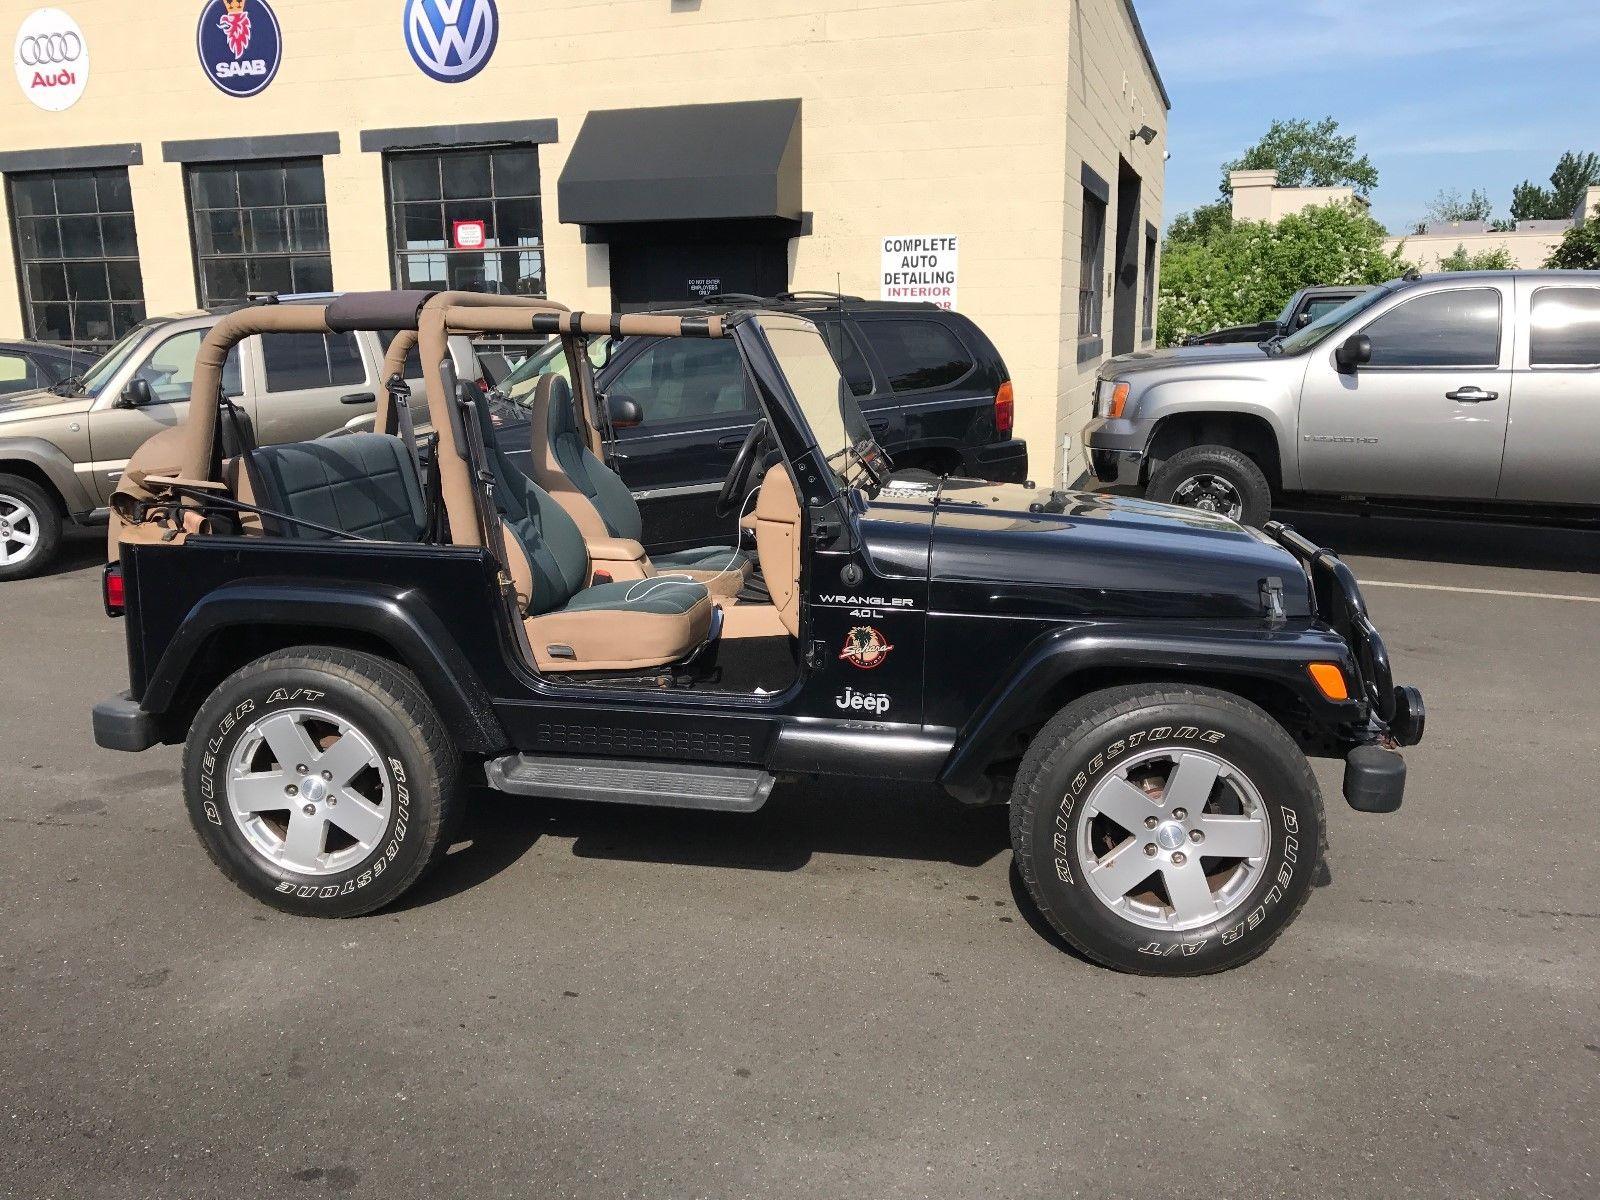 2000 Jeep Wrangler Sahara 2000 Jeep Wrangler Sahara Hard Soft Tops 5spd Manual Black Tan 4 4 Shape 2018 Mycarboard Com